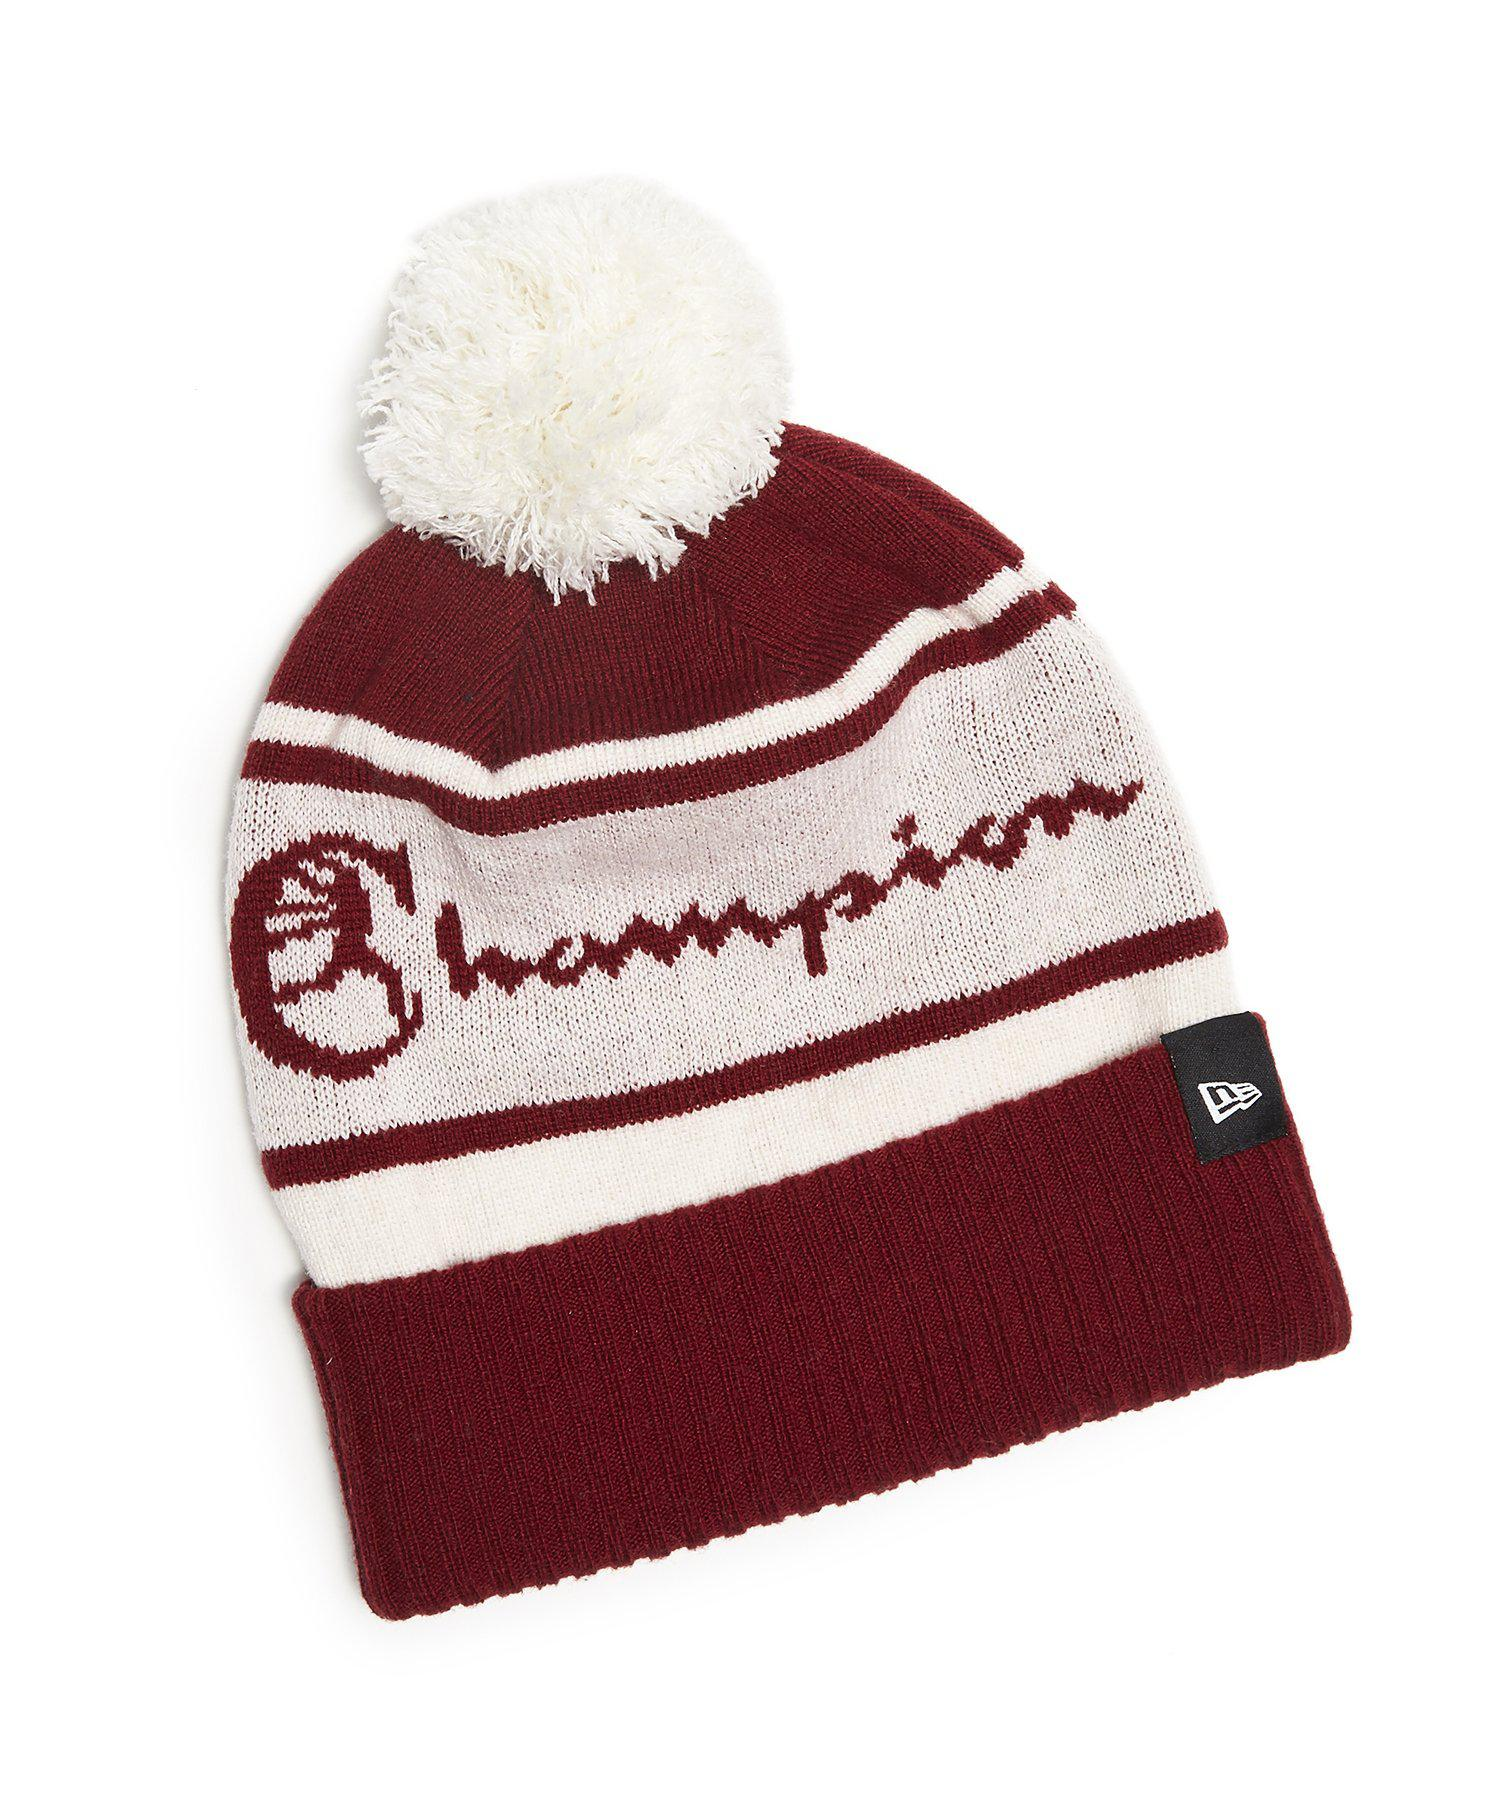 New Era Hats Champion + New Era Pom Pom Beanie In Cardinal in Red . 8aad673f3e2f